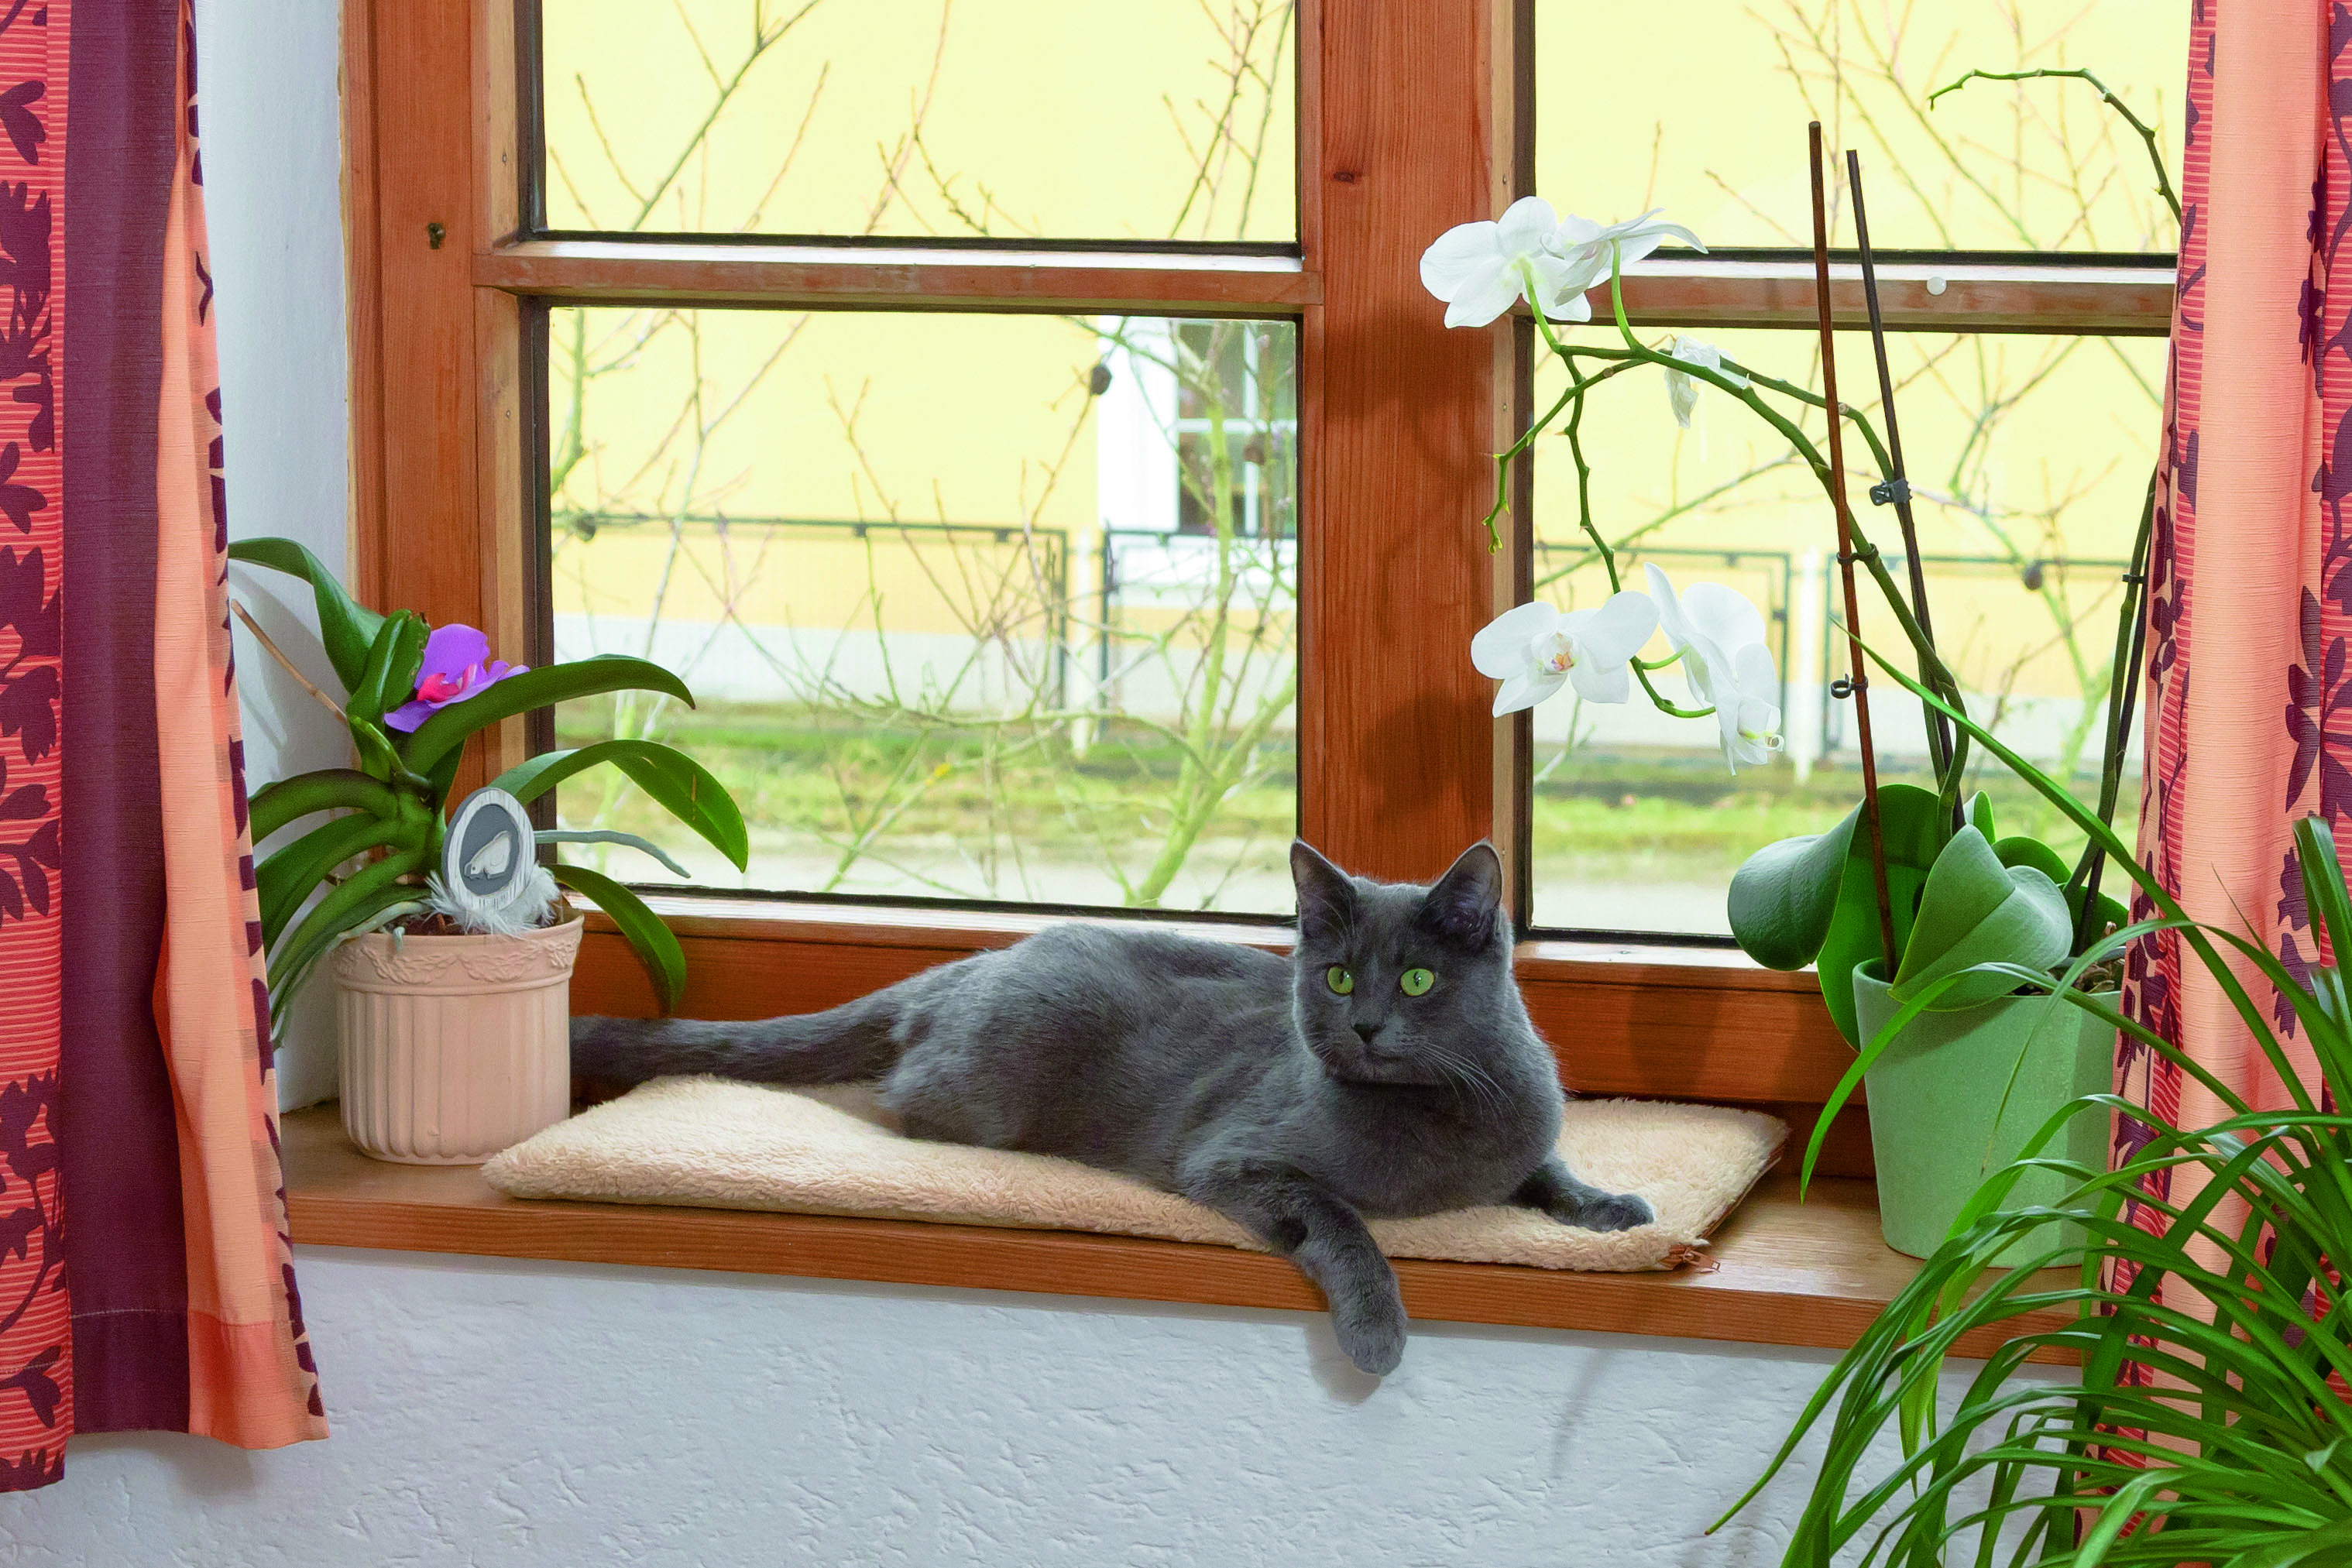 Kerbl Fensterliegekissen 60 x 26 x 2cm selbstwärmend Liege Kissen Fensterbank 2